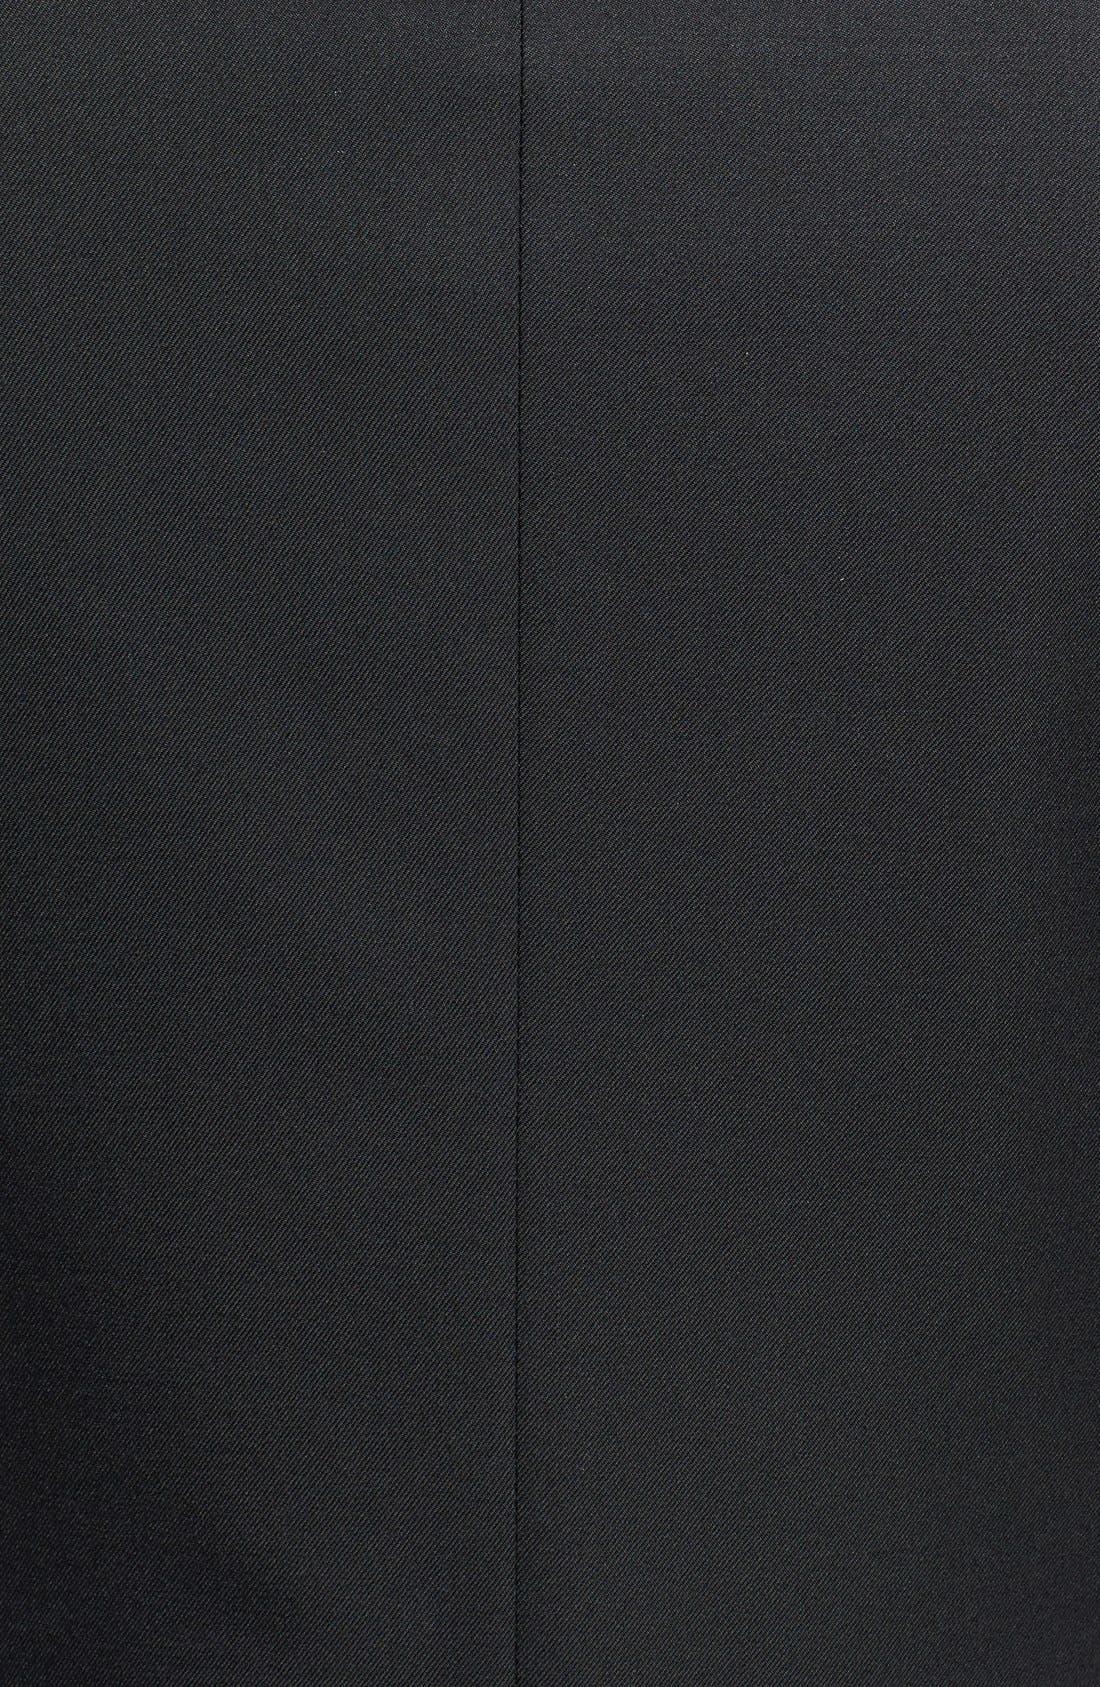 Trim Fit Wool Blazer,                             Alternate thumbnail 3, color,                             001